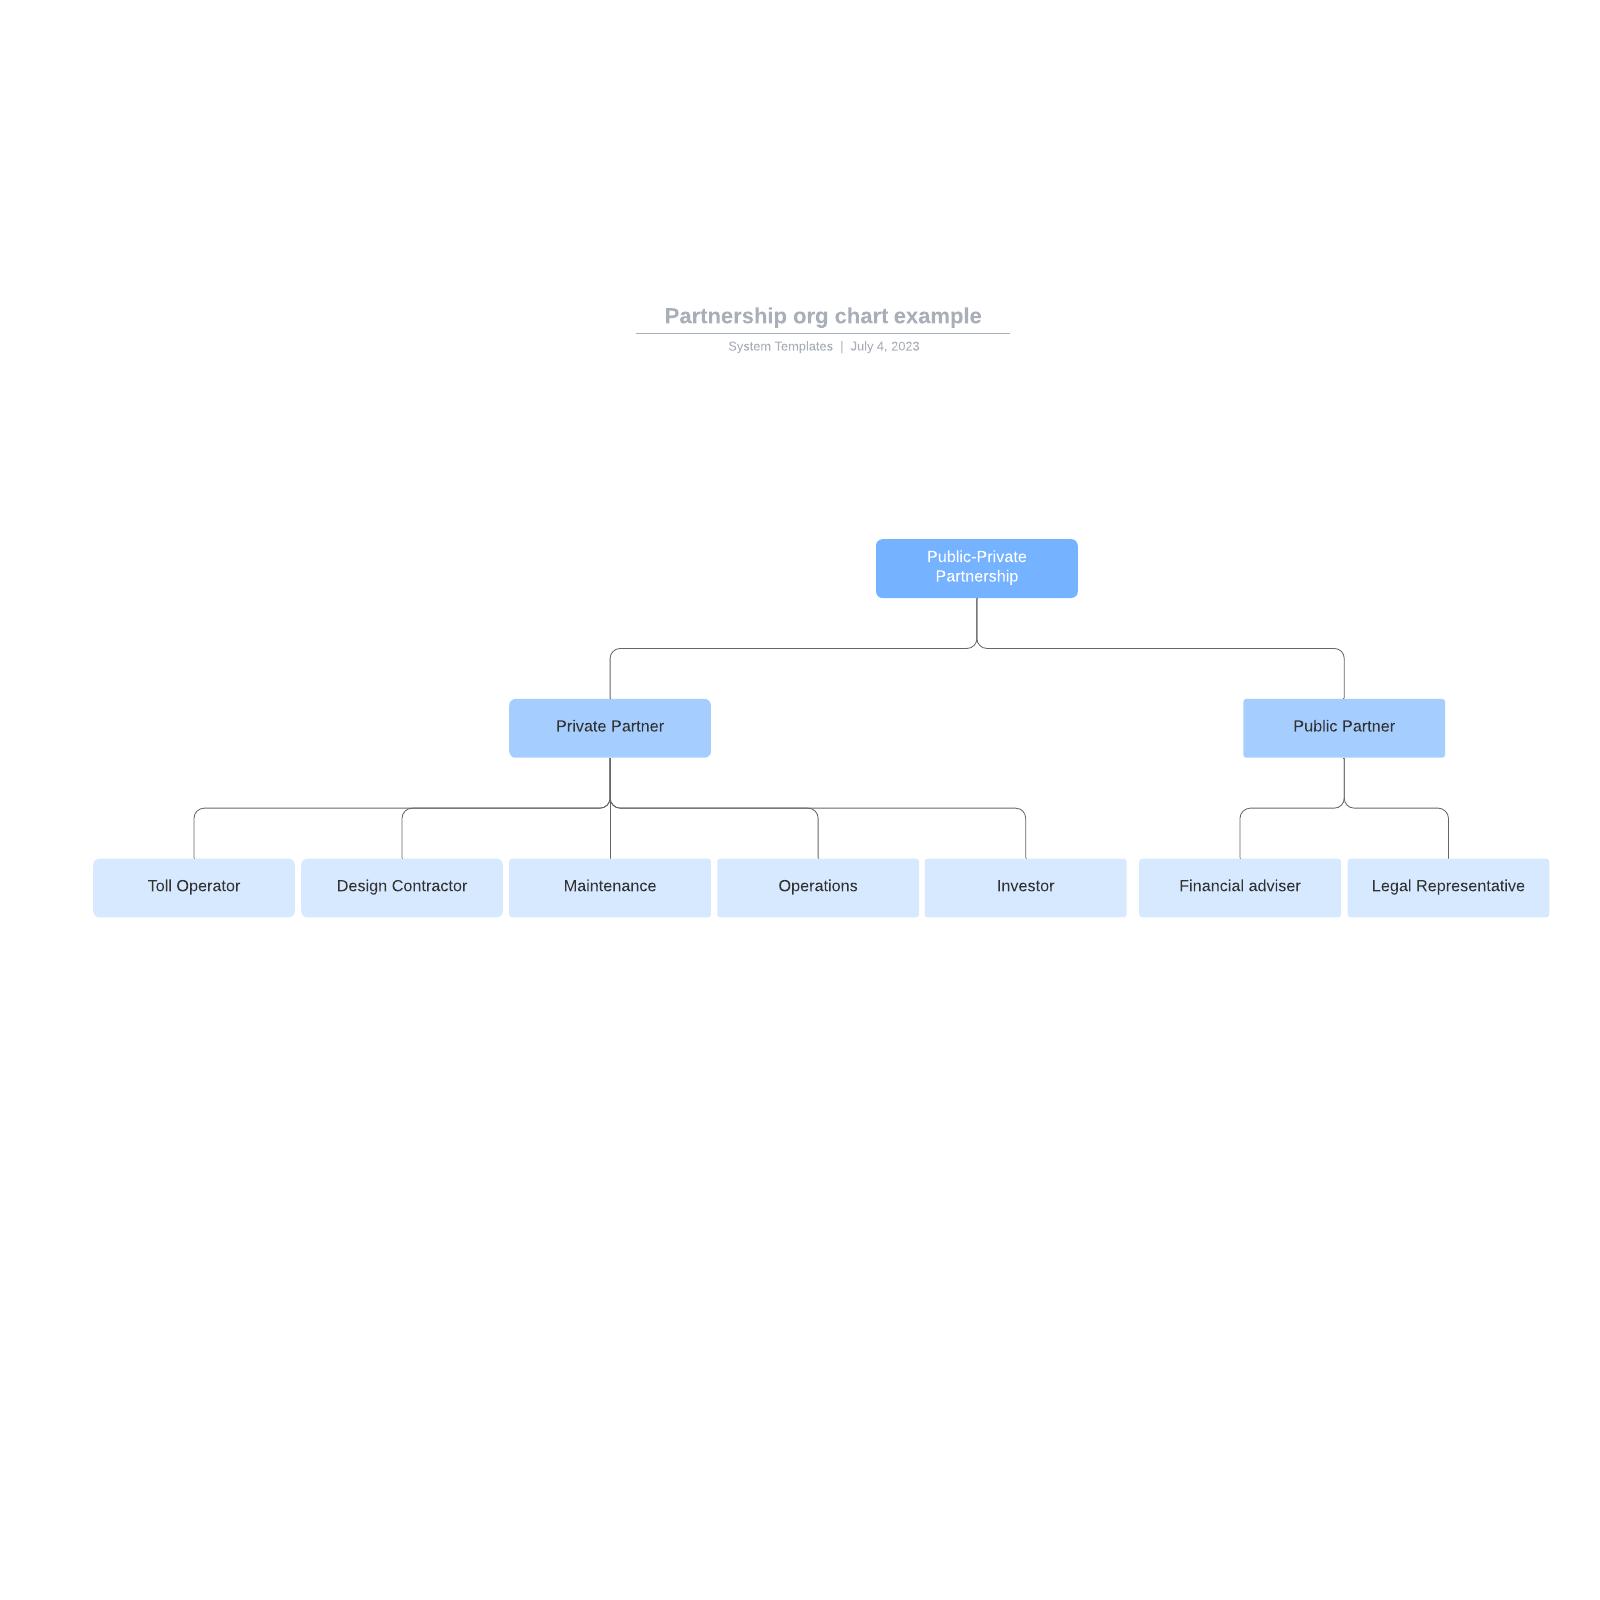 Partnership org chart example